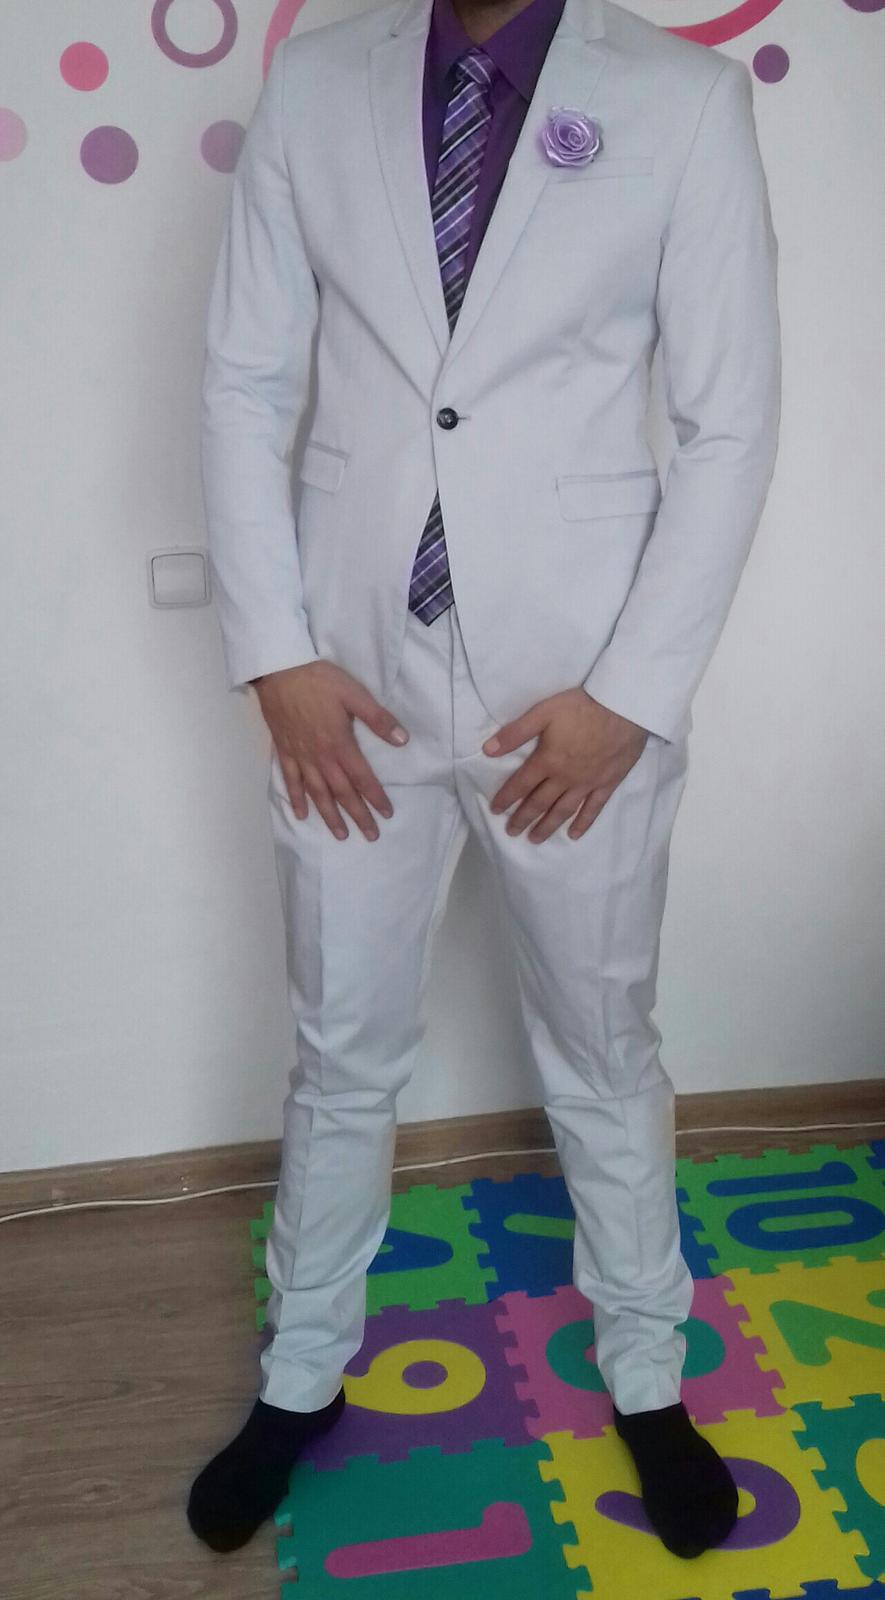 79f87d95d4 Pánský oblek značka zara man